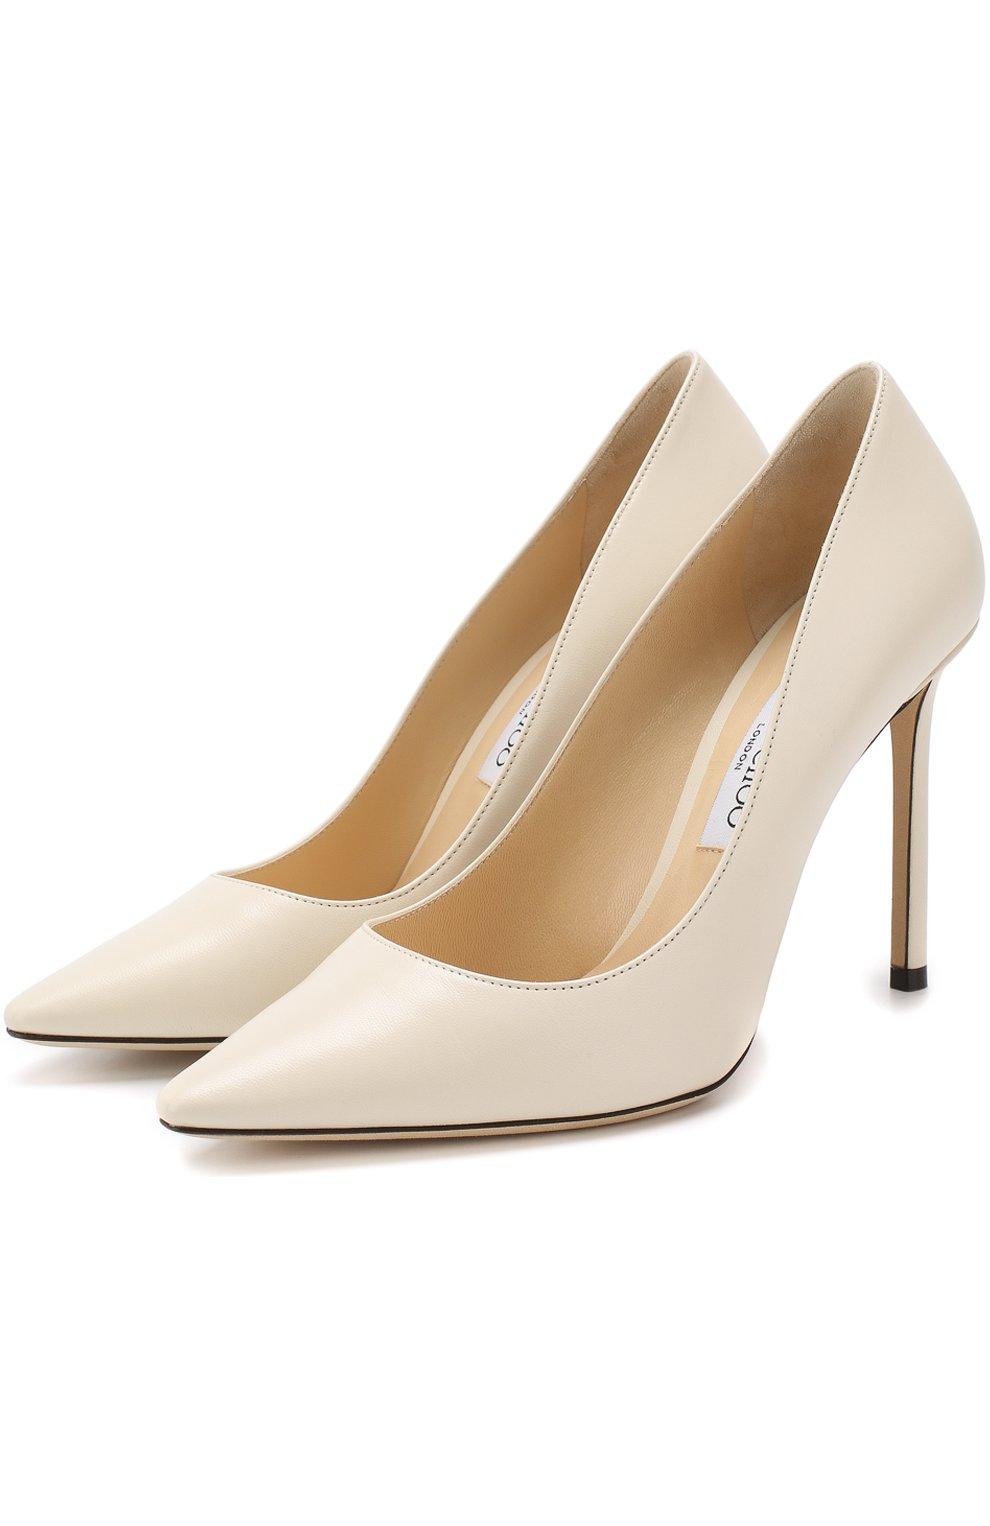 Женские кожаные туфли romy 100 на шпильке JIMMY CHOO белого цвета, арт. R0MY 100/KID   Фото 1